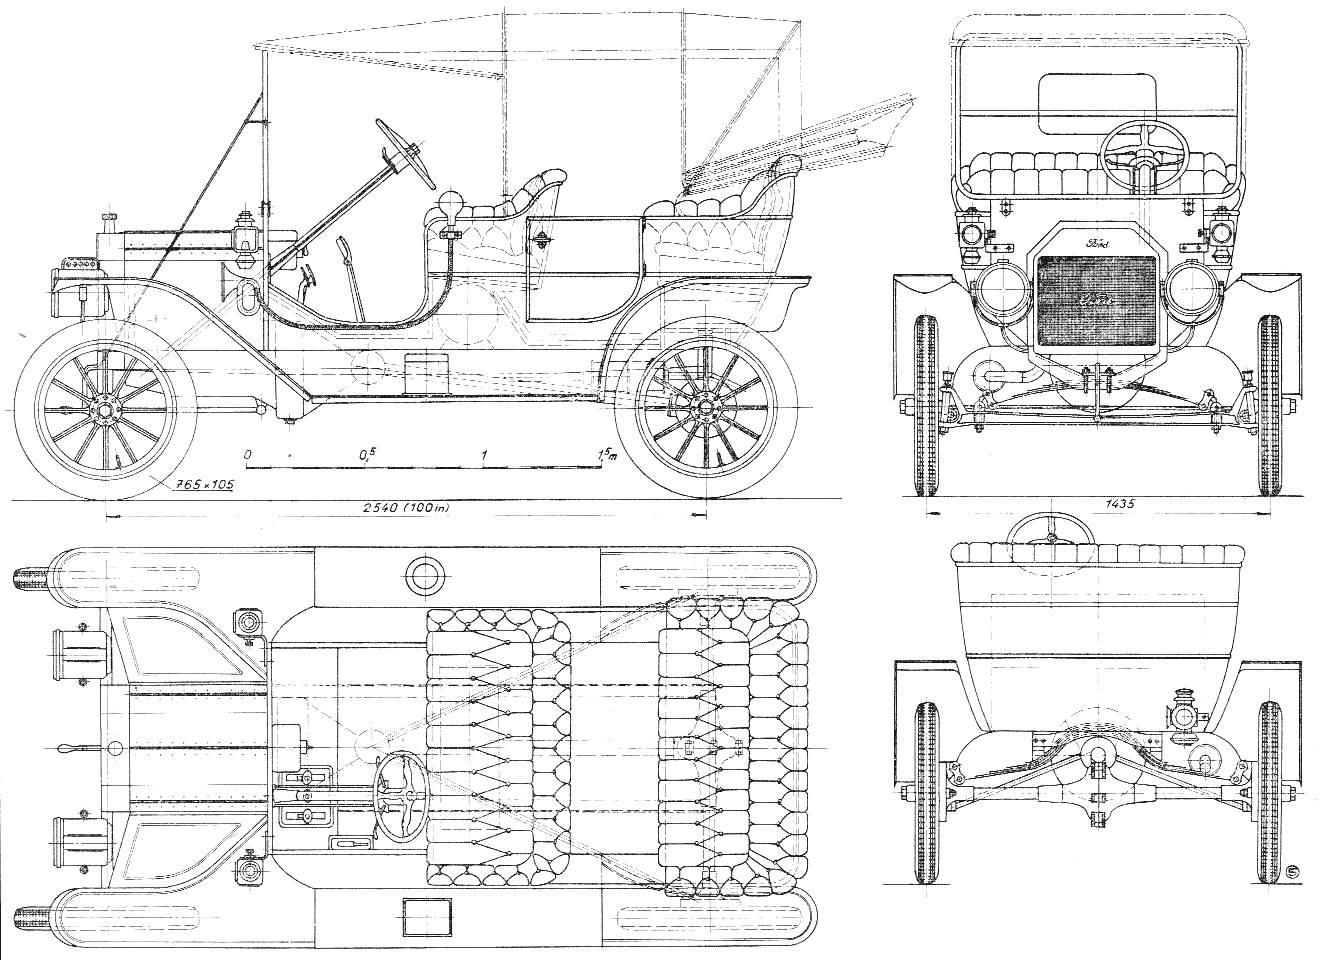 1915 ford model t wiring diagram logic venn syllogism all diagram1915 library